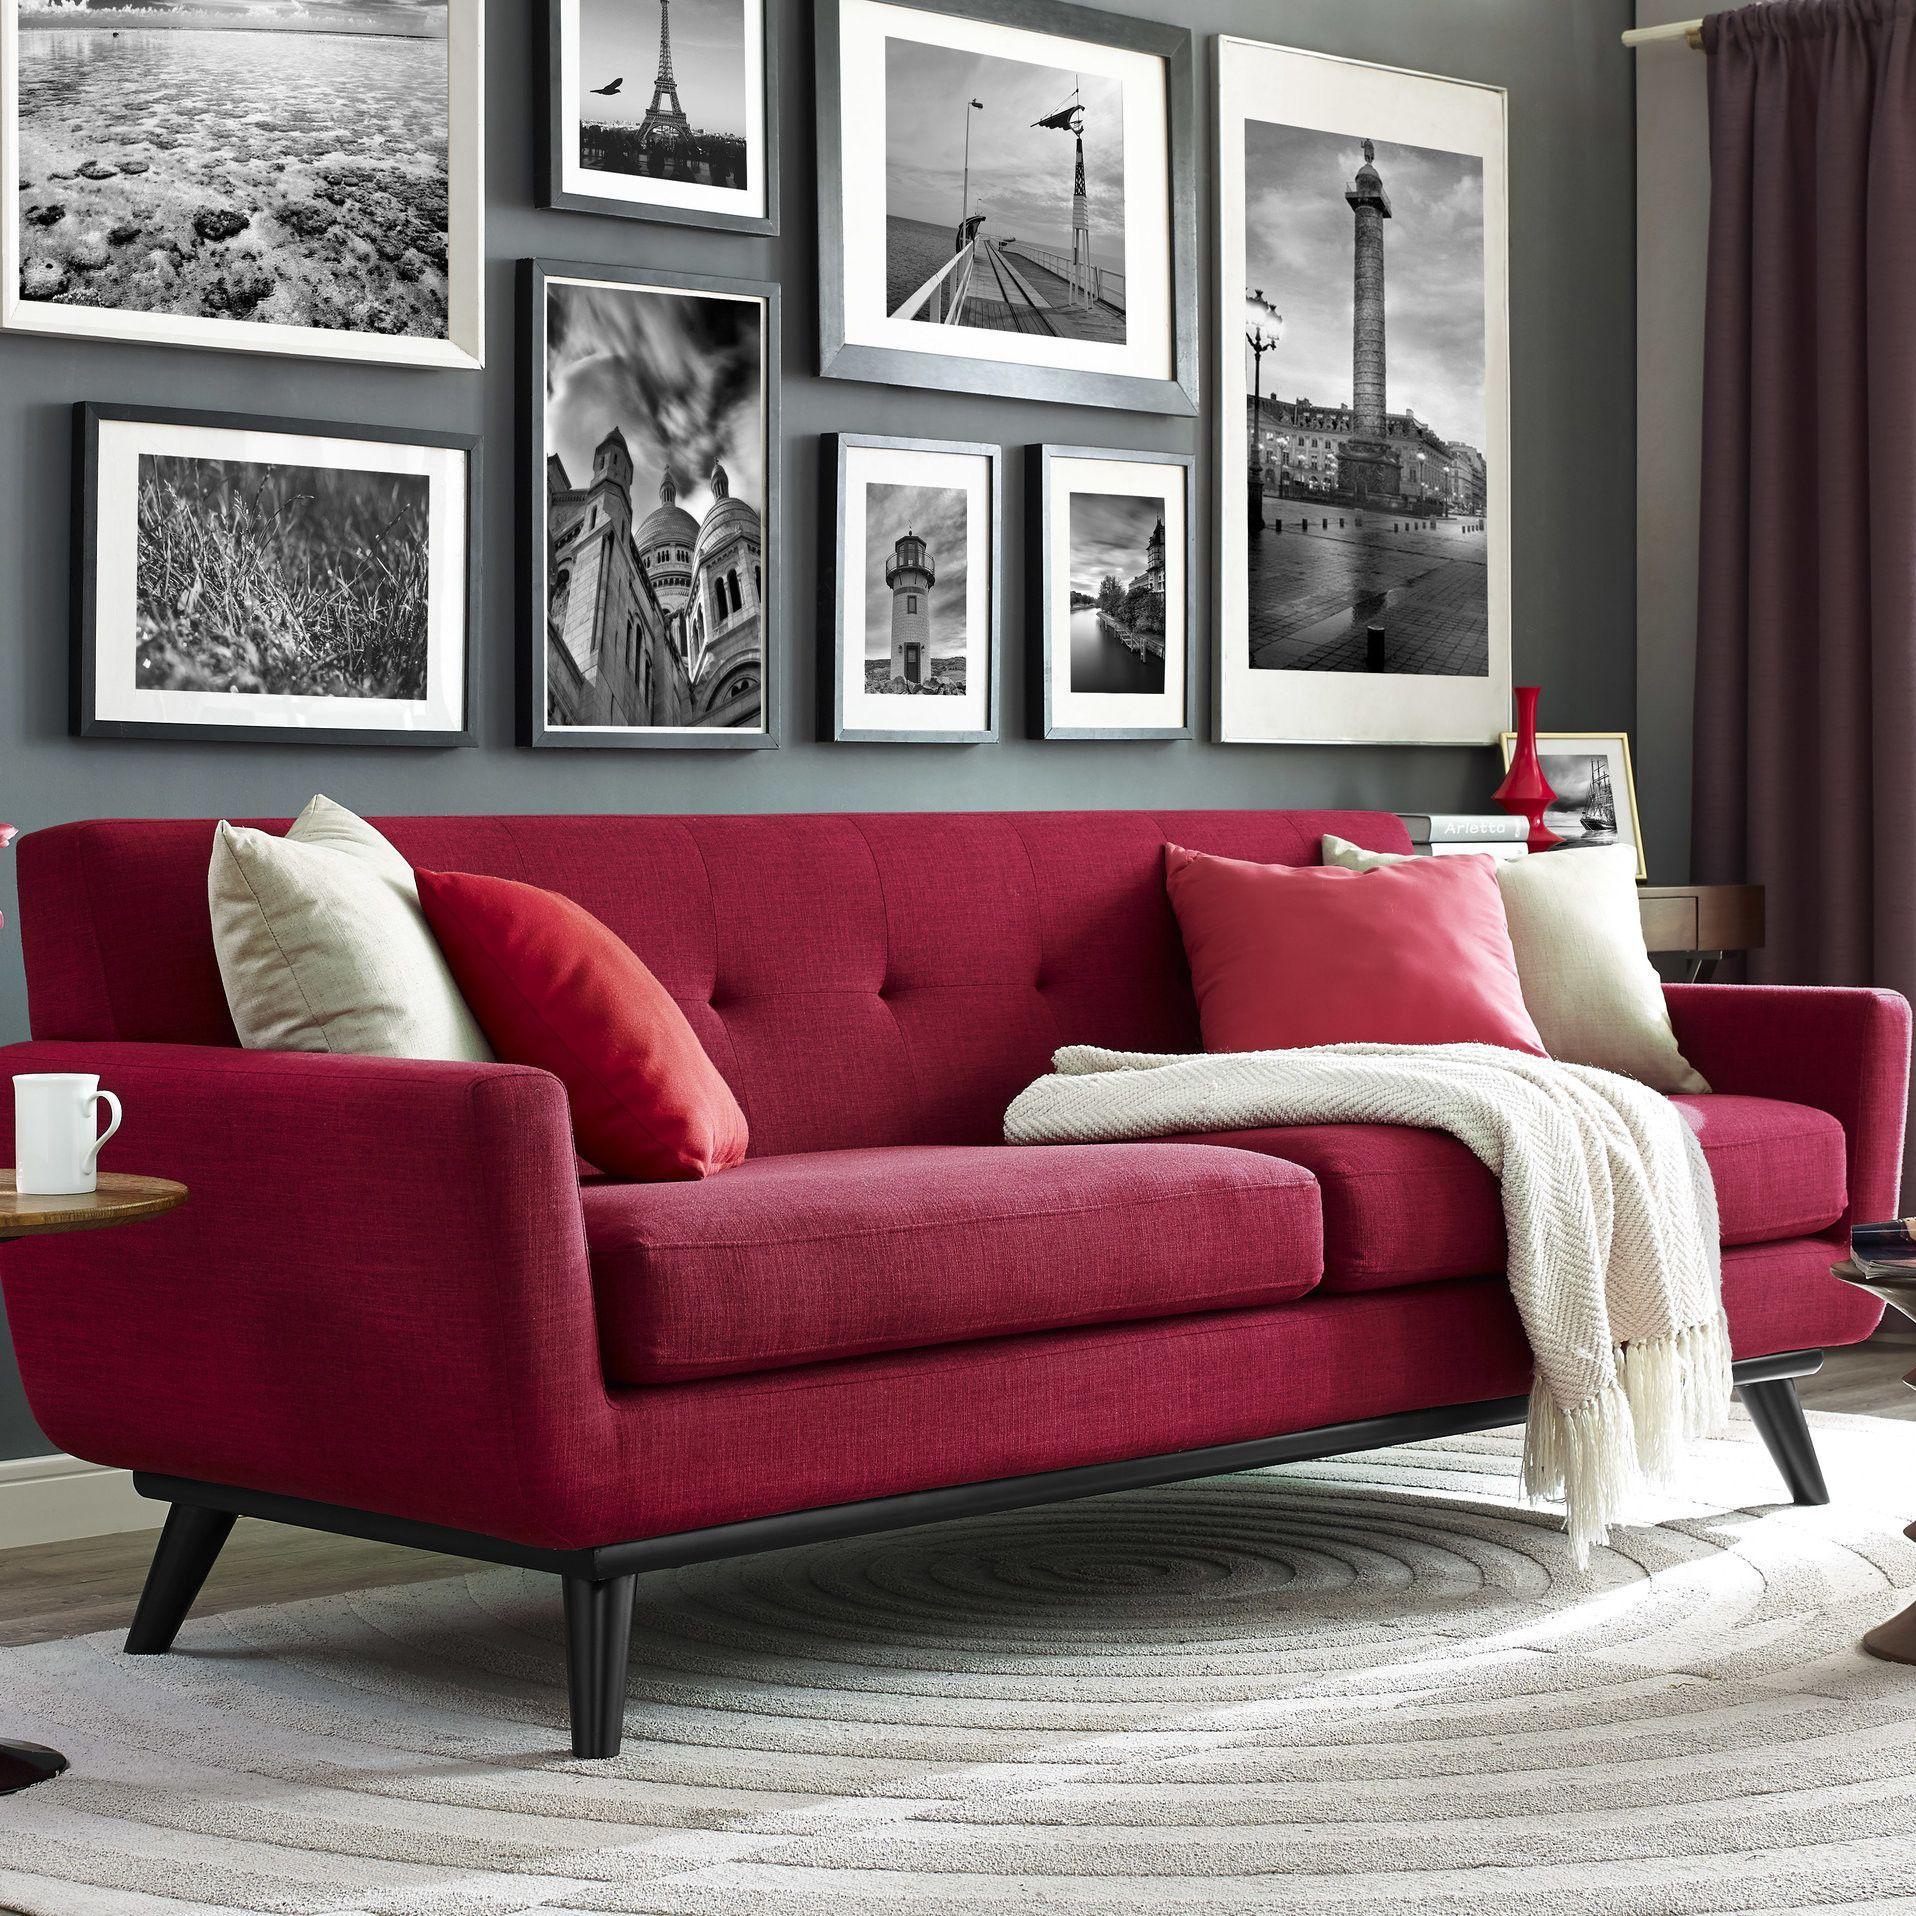 James sofa red couch in 2018 pinterest maison salon and canap bordeaux - Canape rouge bordeaux ...